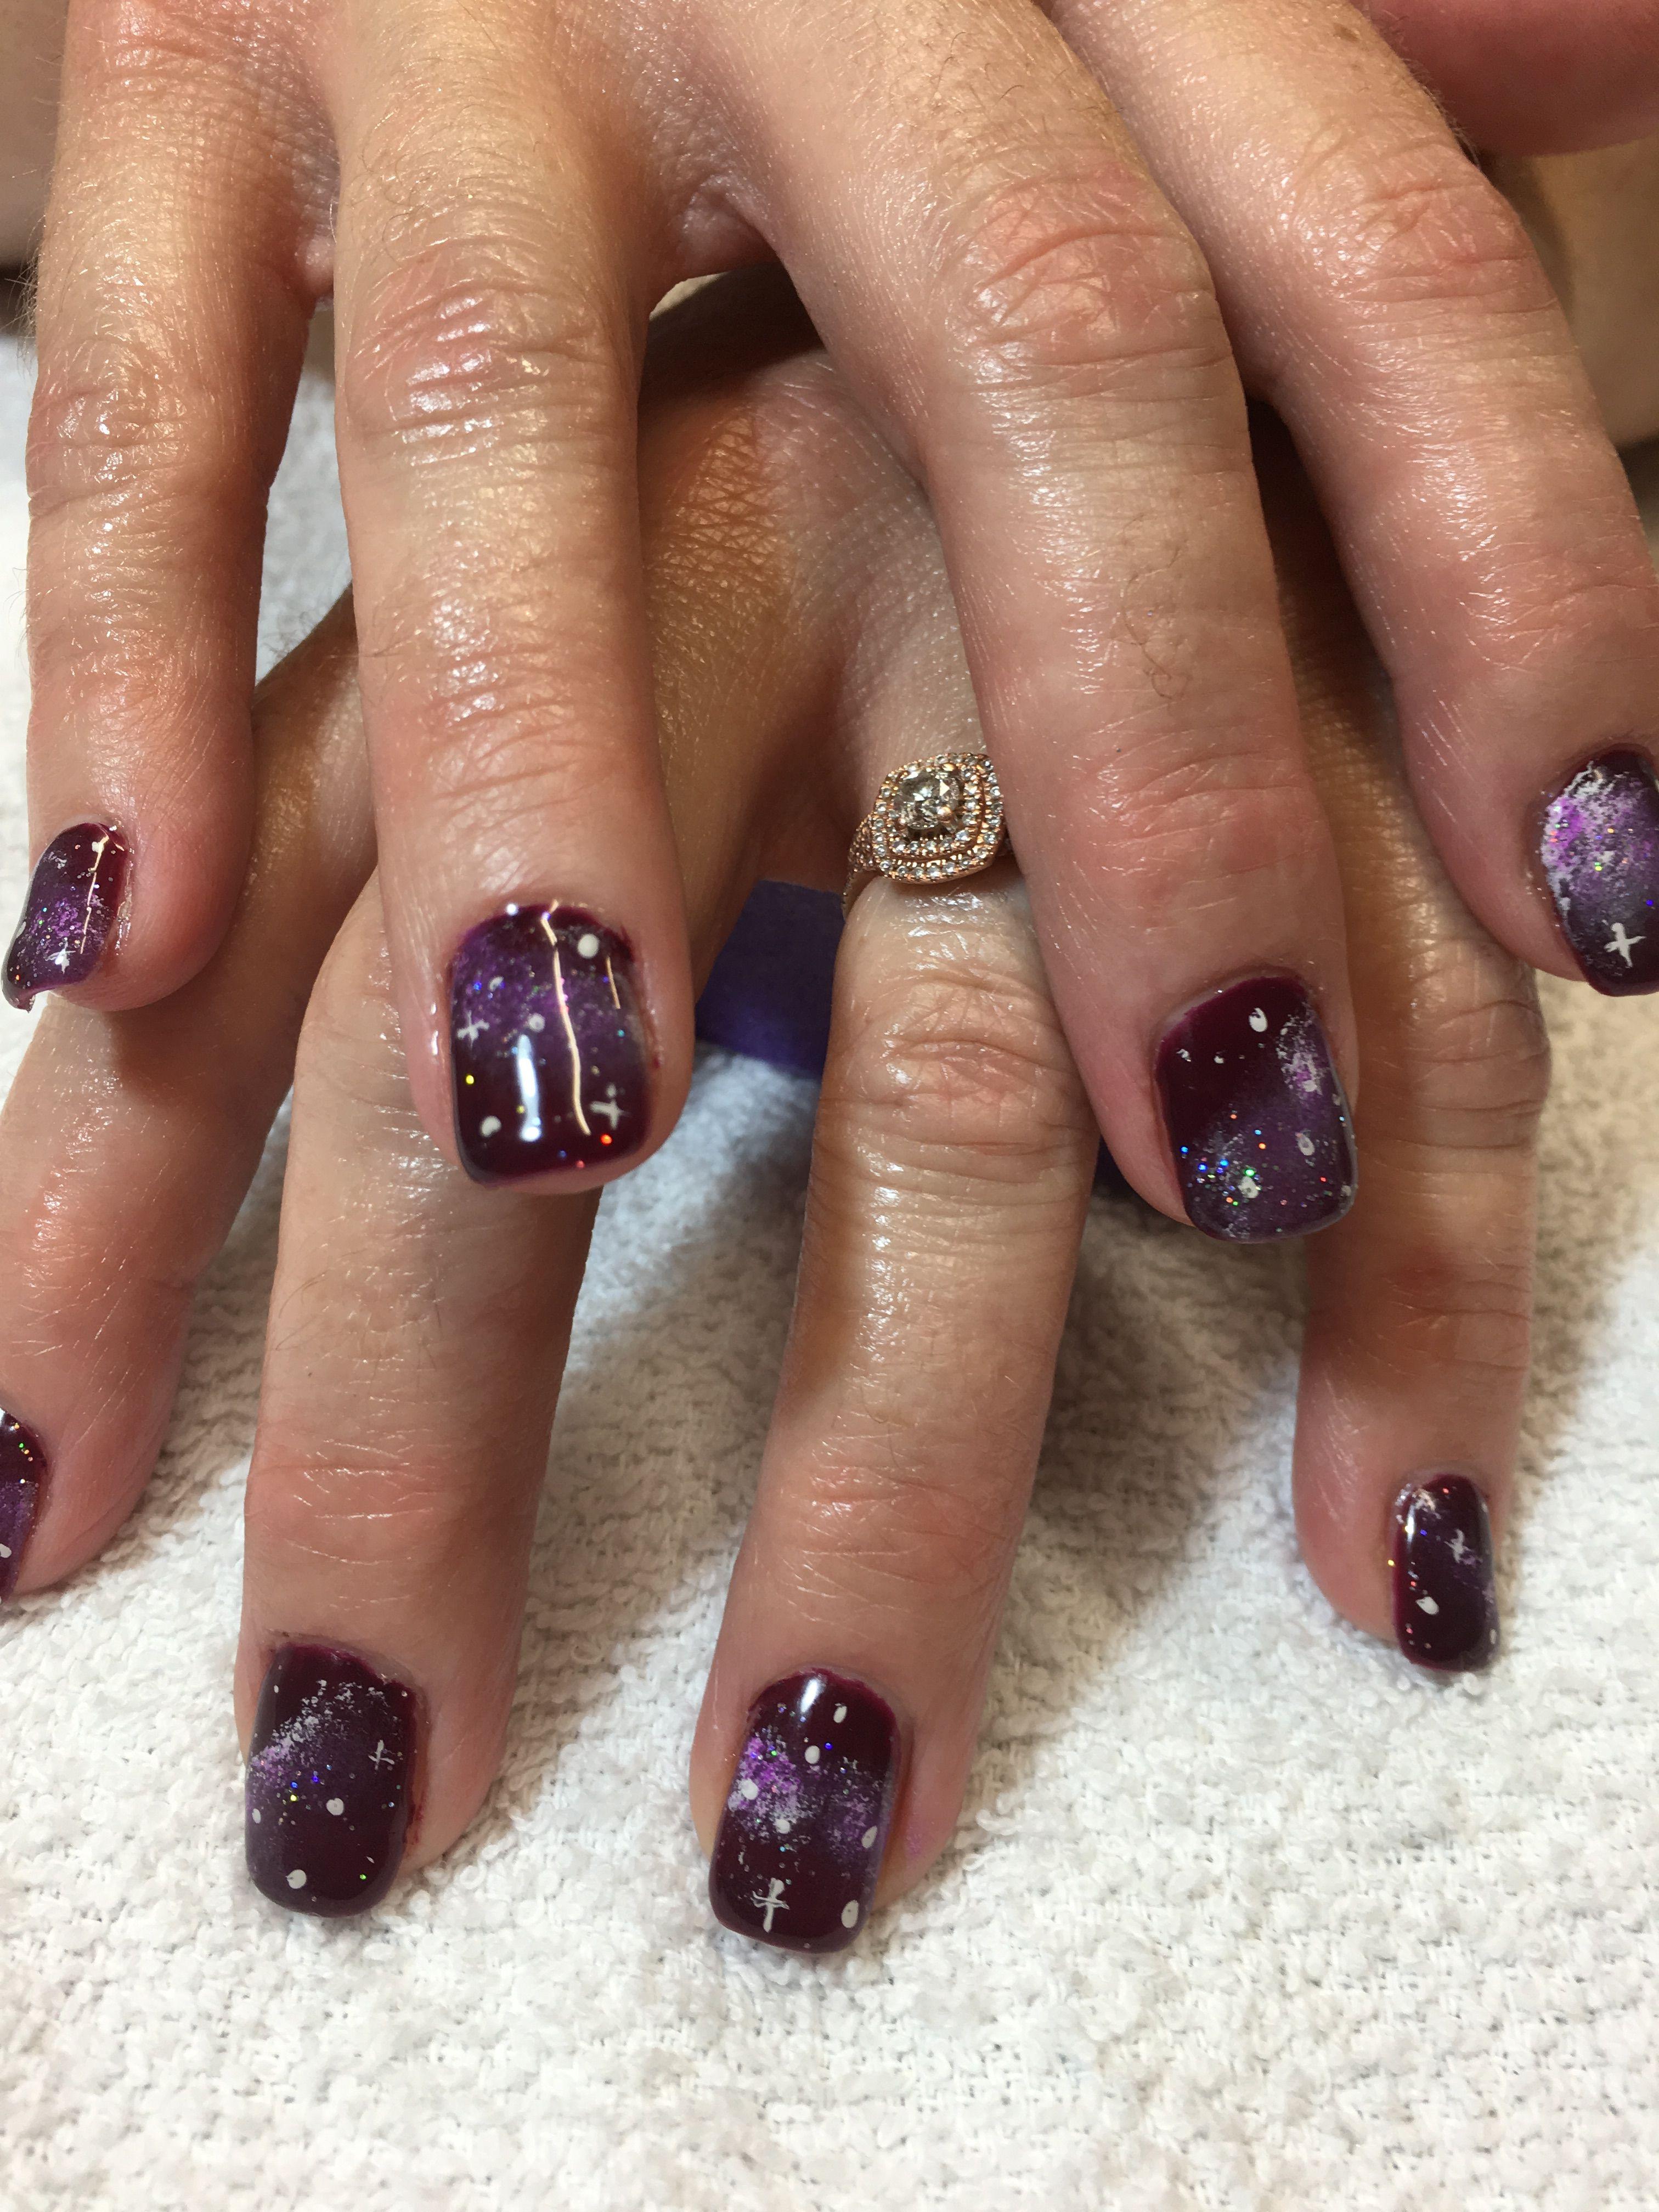 Burgundy galaxy nails art | Cheryls nail designs | Pinterest ...